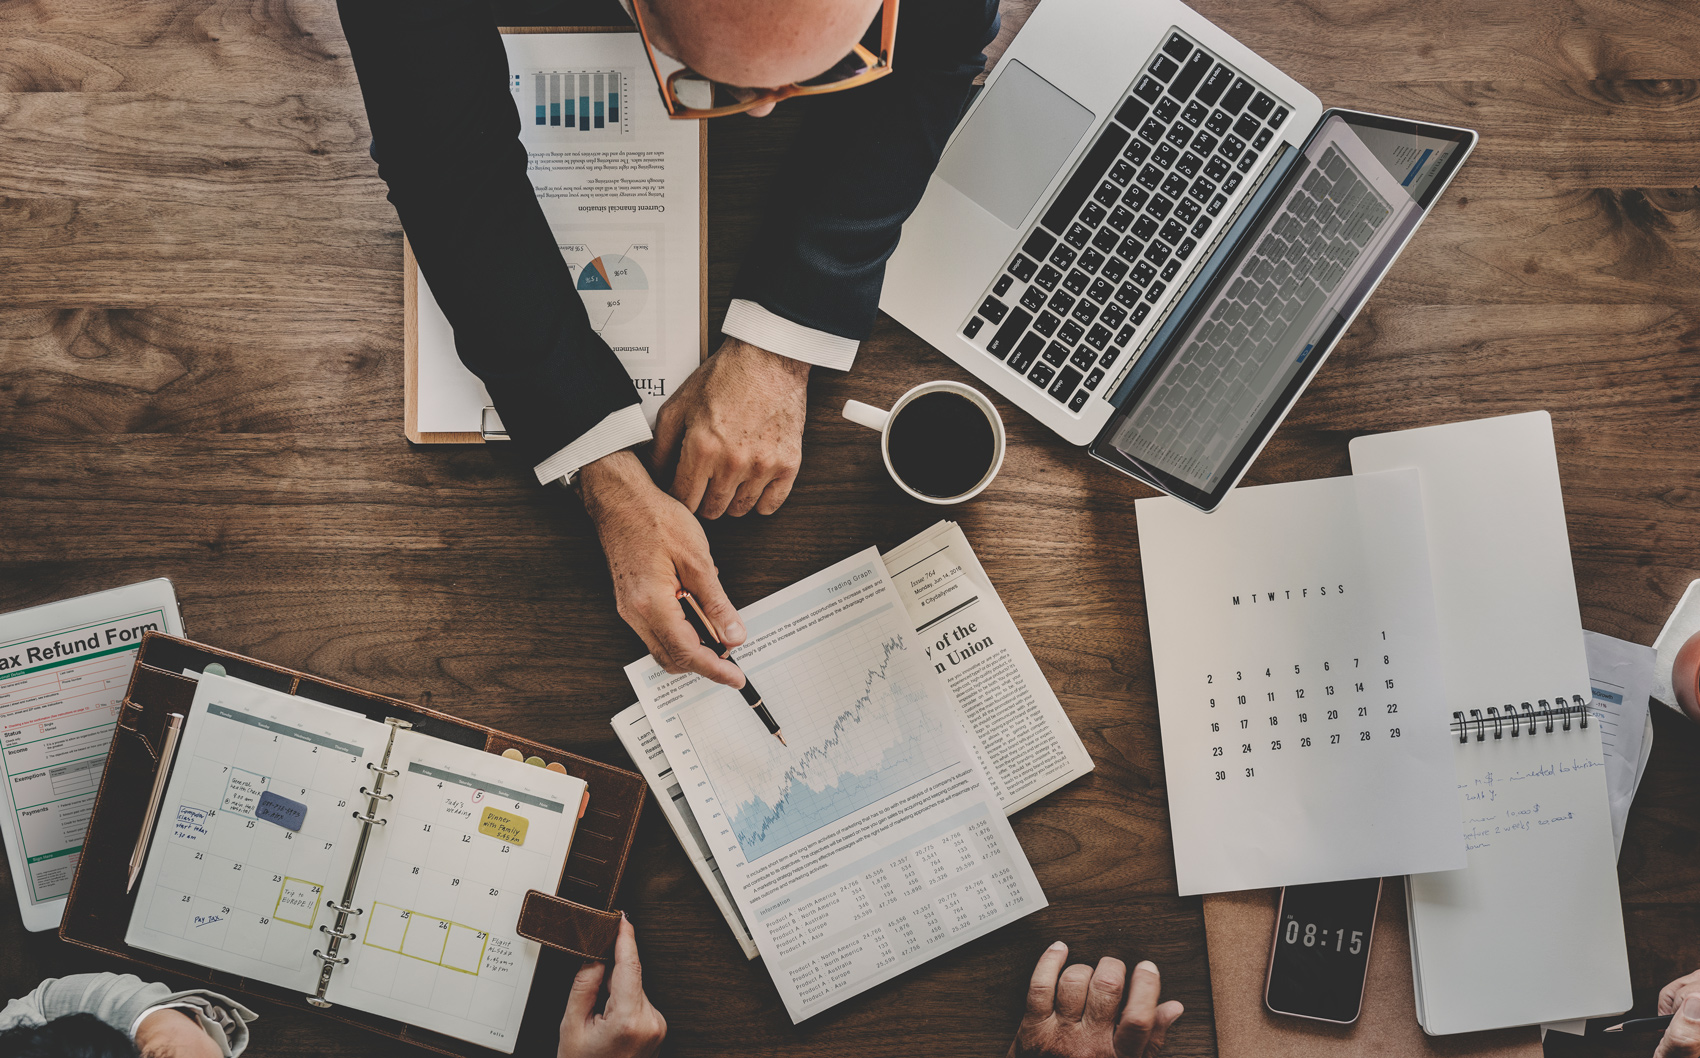 Top 5 Characteristics of a Successful Sales Management Professional